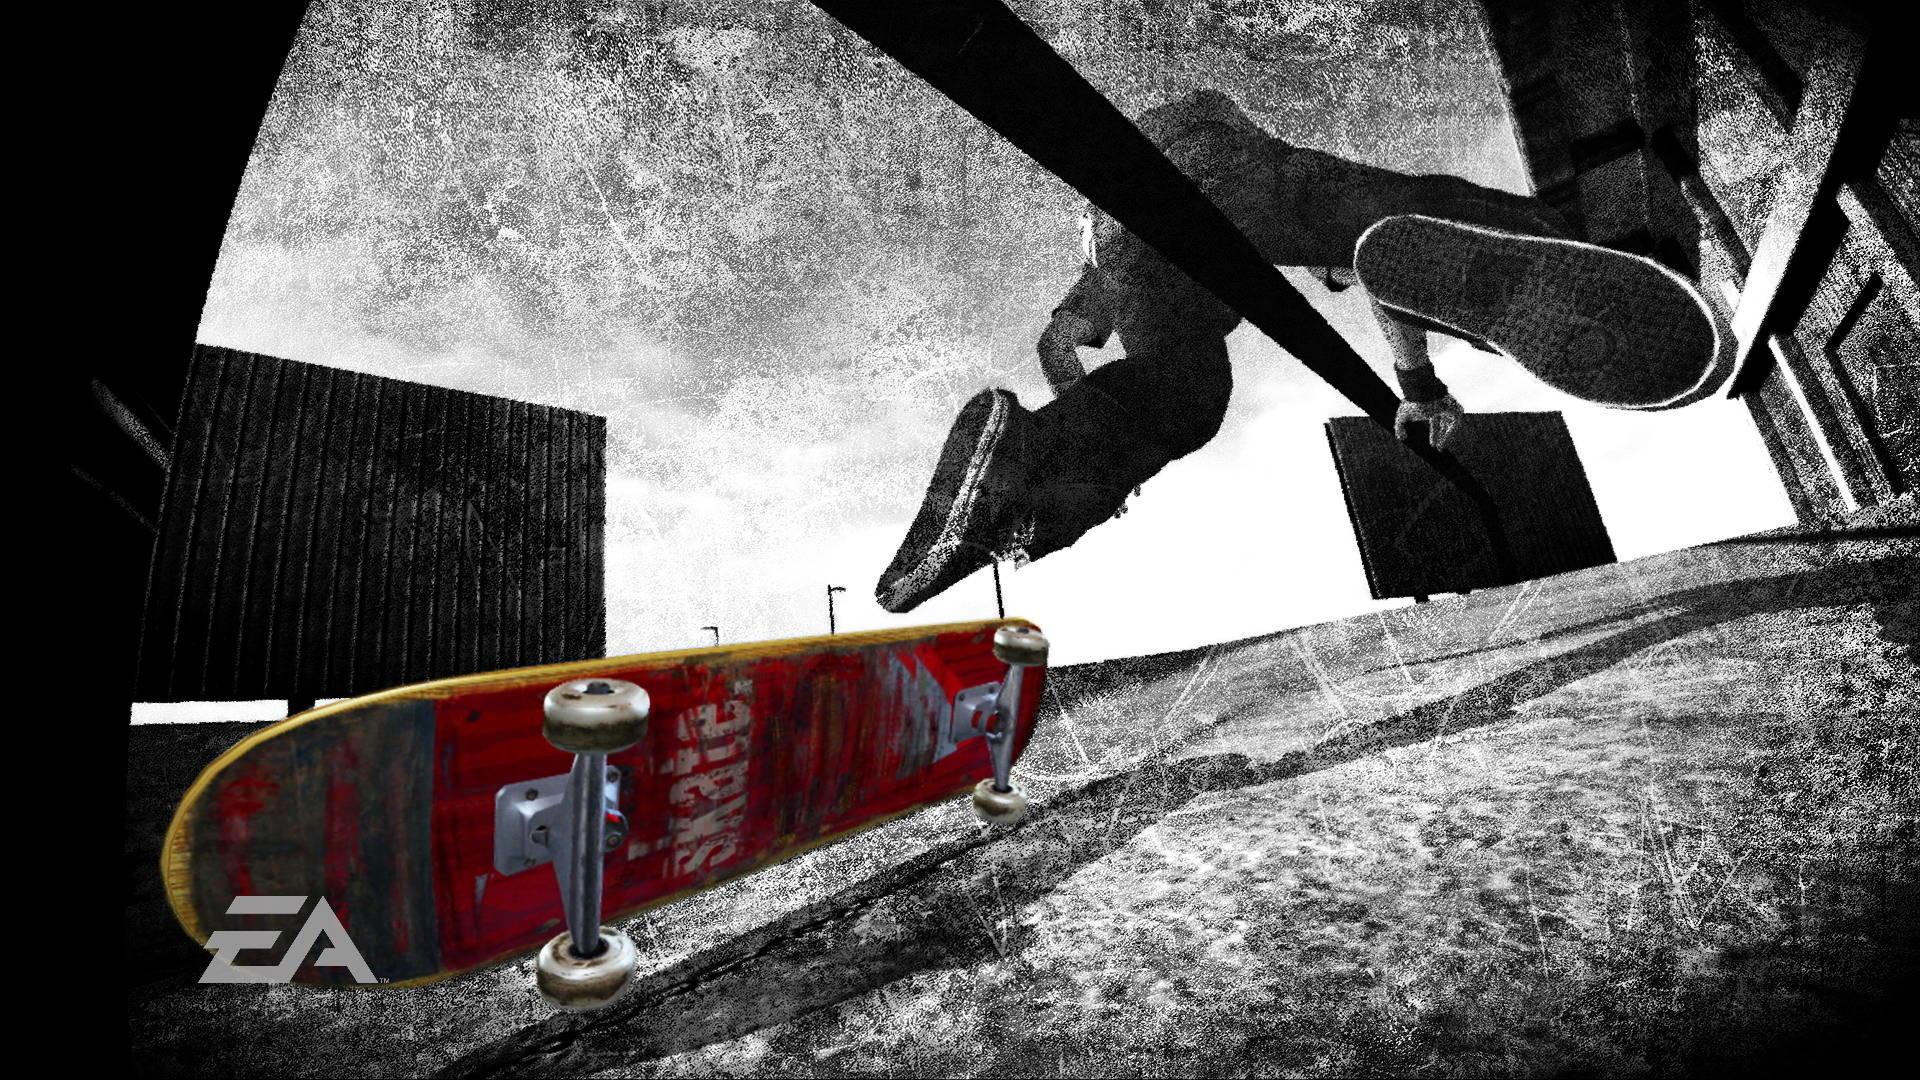 Skateboard Brand Wallpaper HD ·①